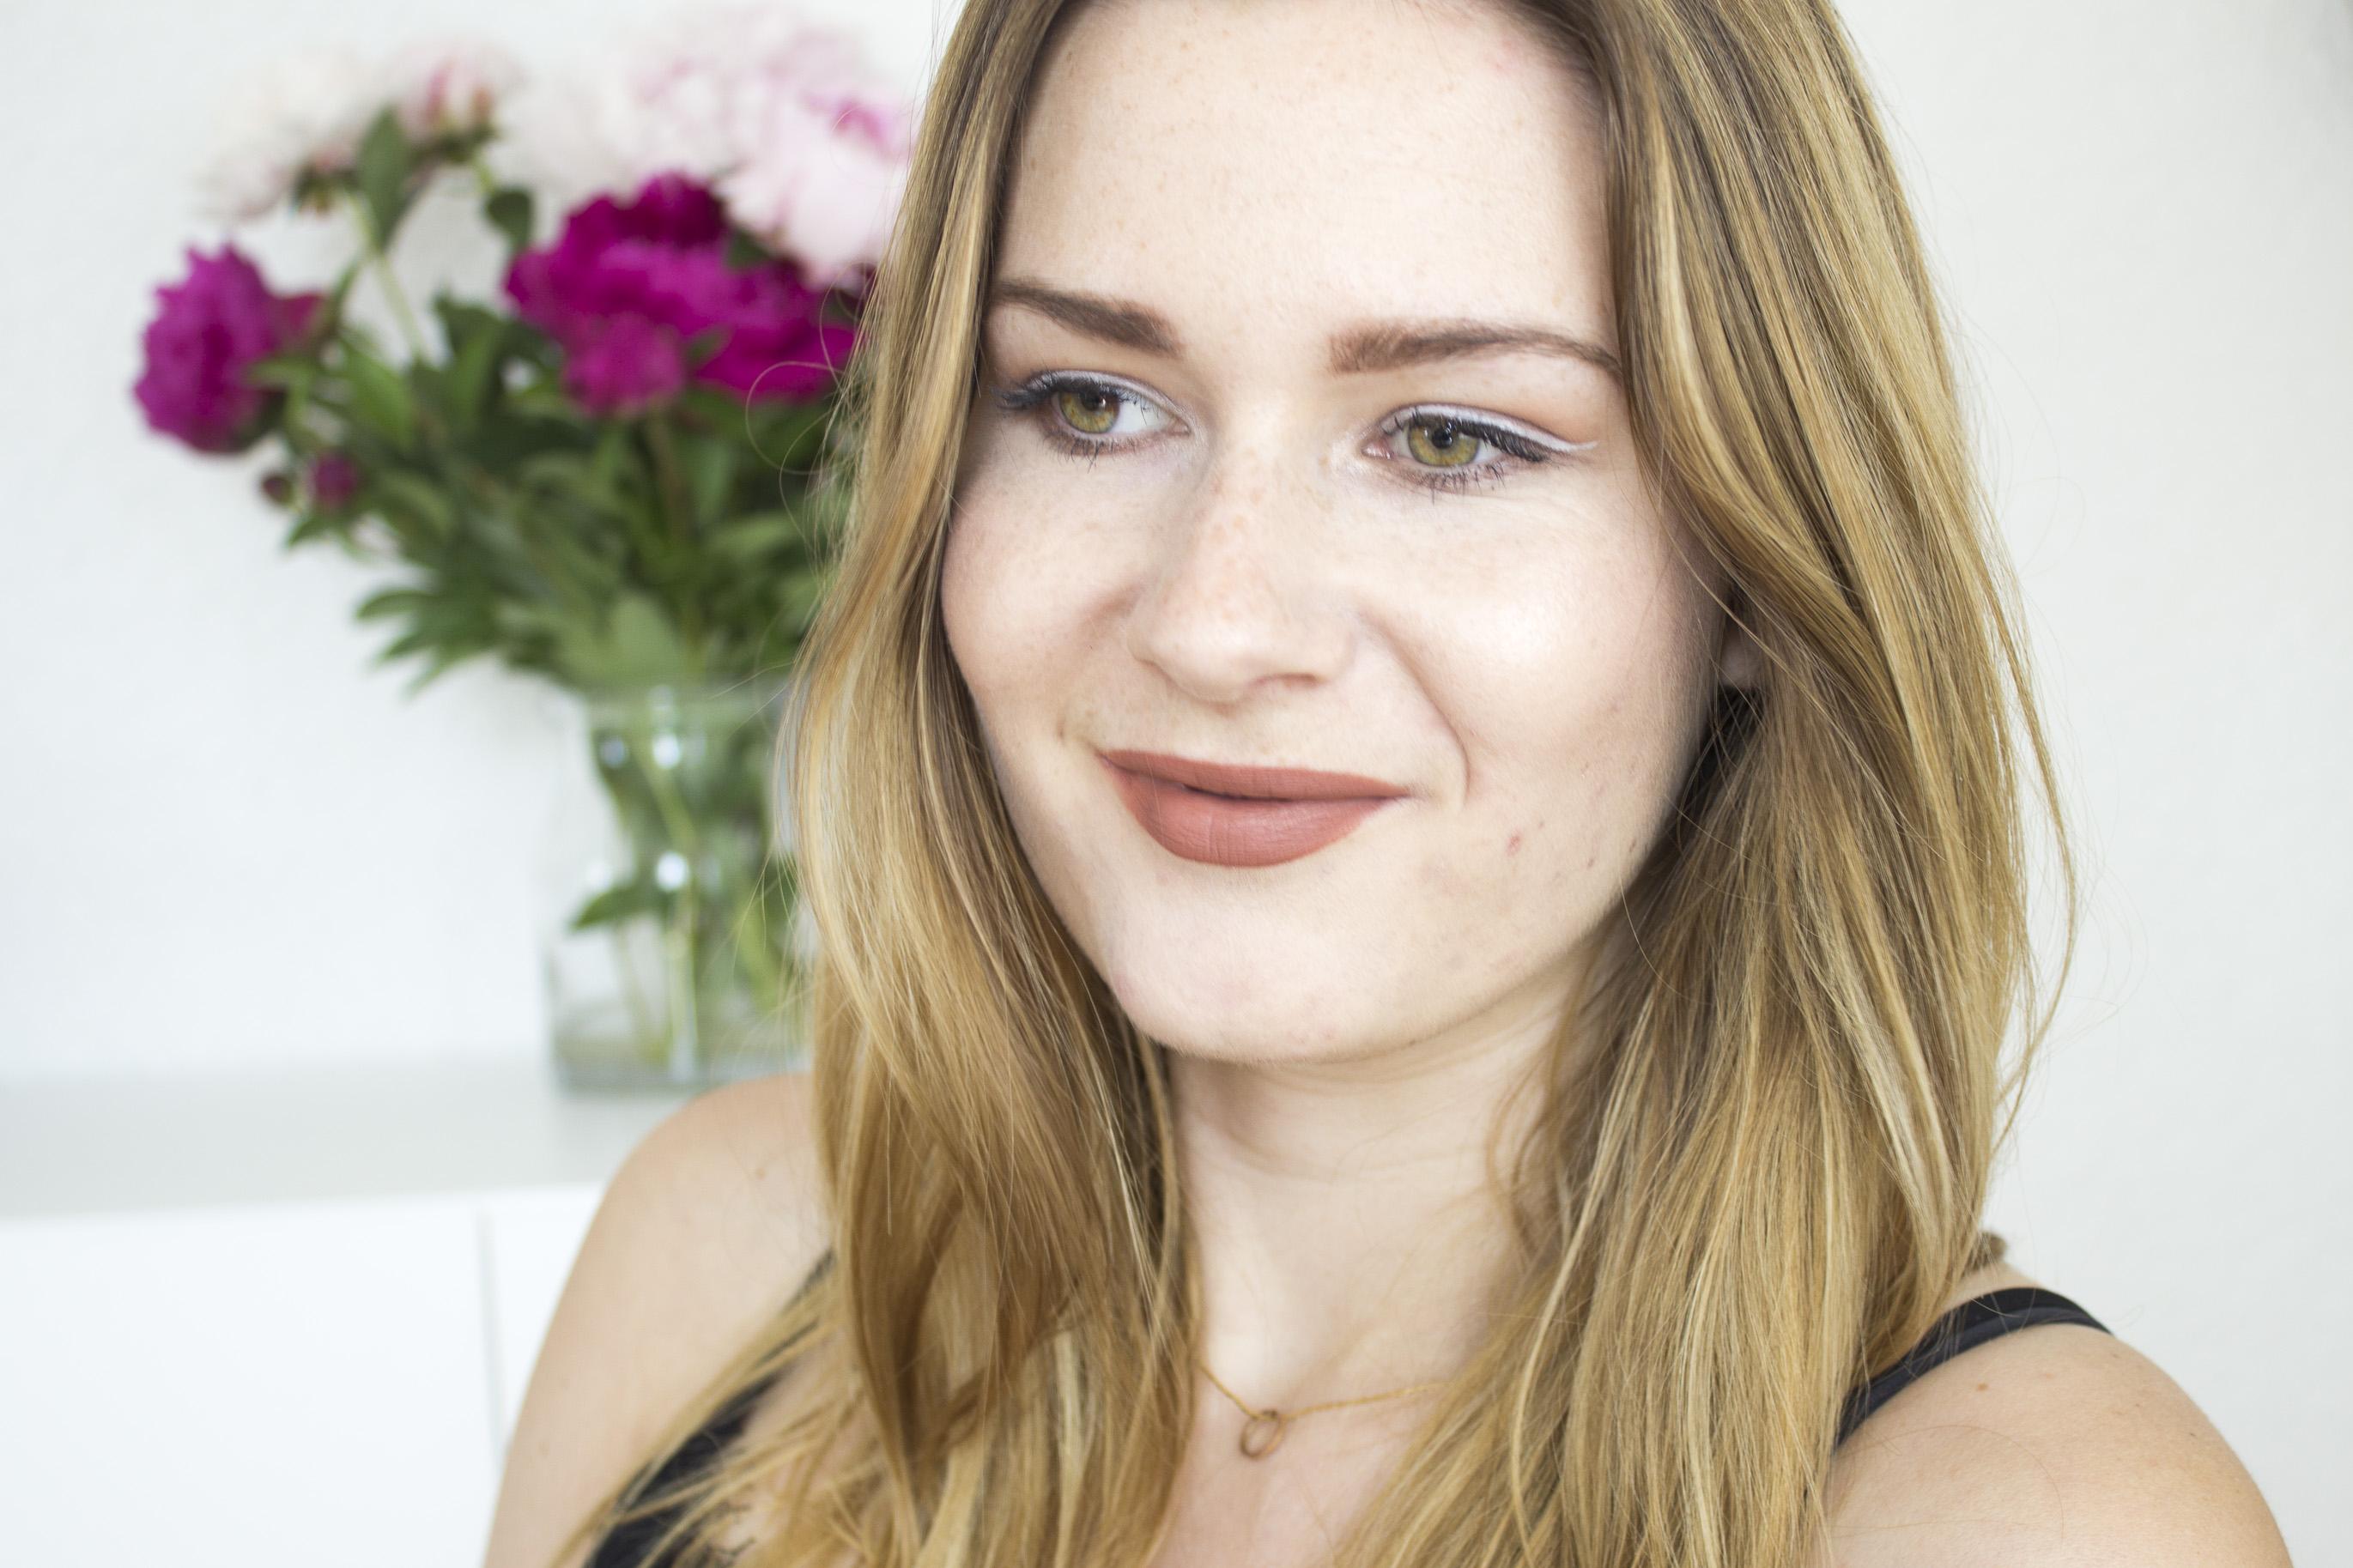 Taupe Eyes & Lips With White Eyeliner - Nachgeschminkt